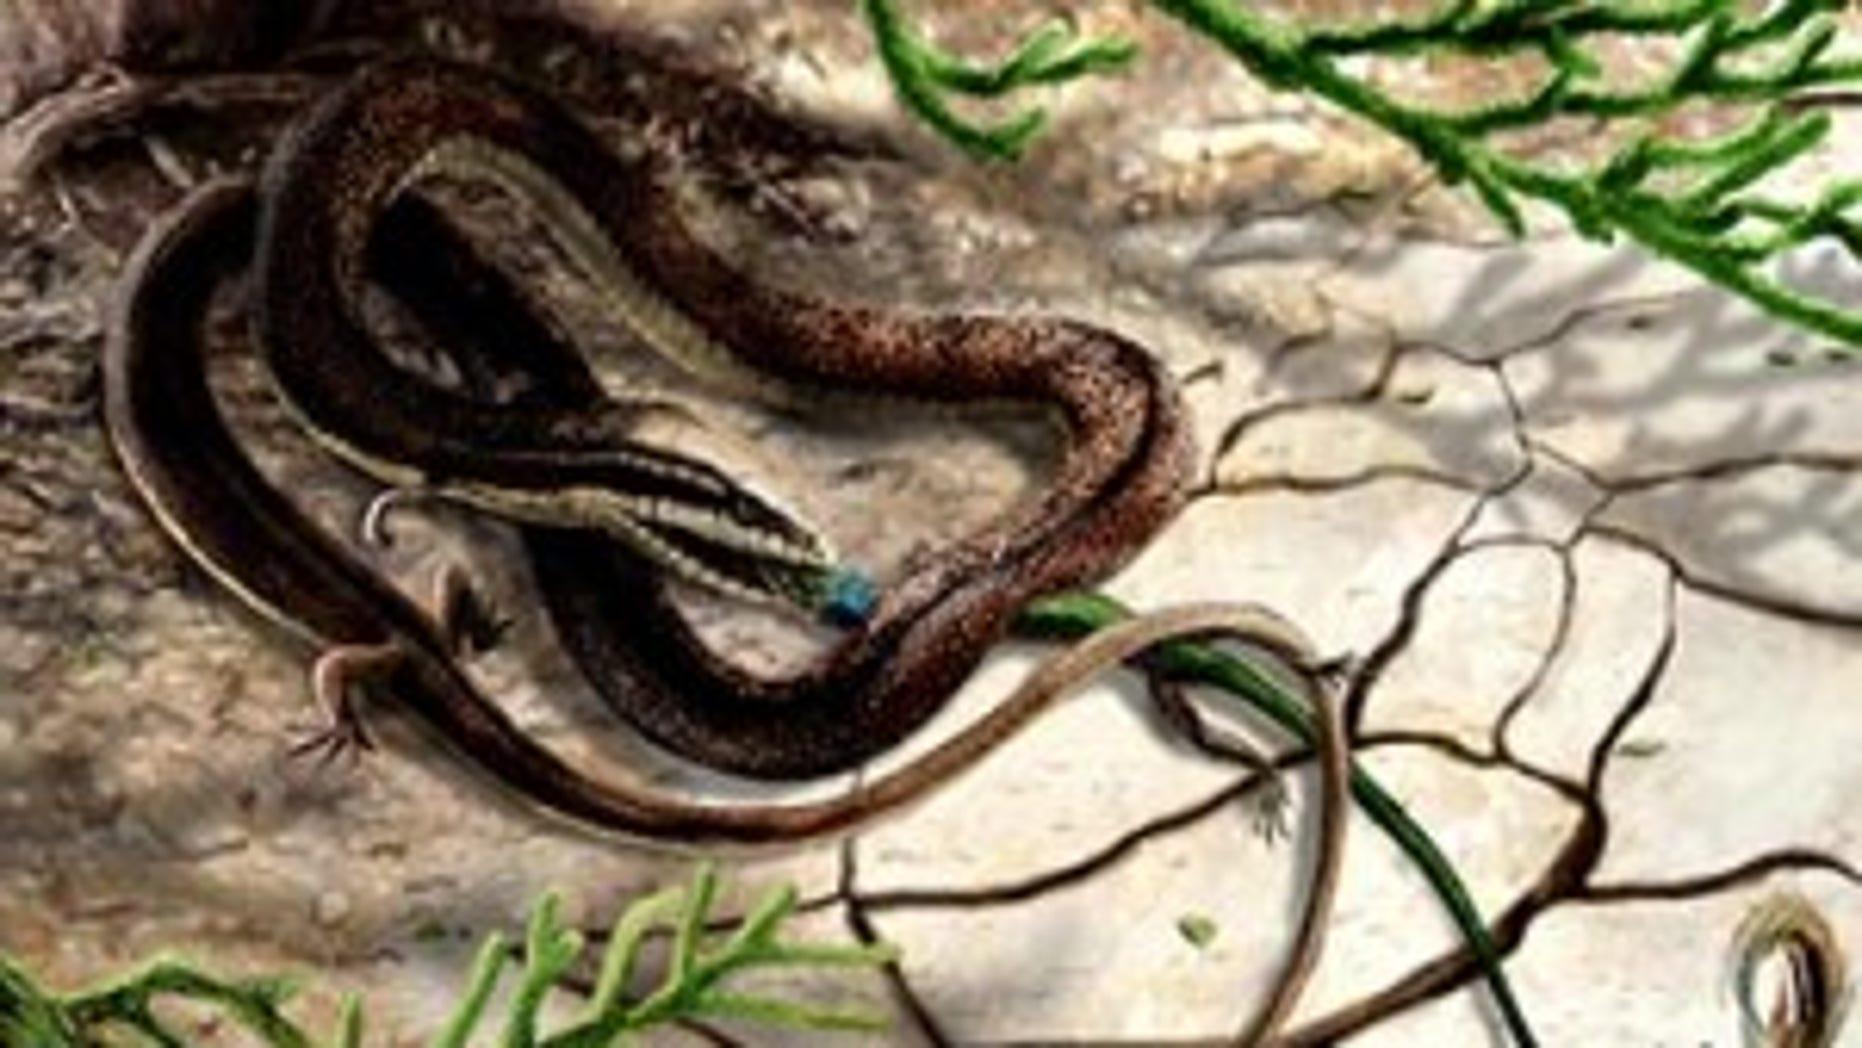 Artist's impression of Tetrapodophis amplectus with its prey, olindalacerta (salamander).